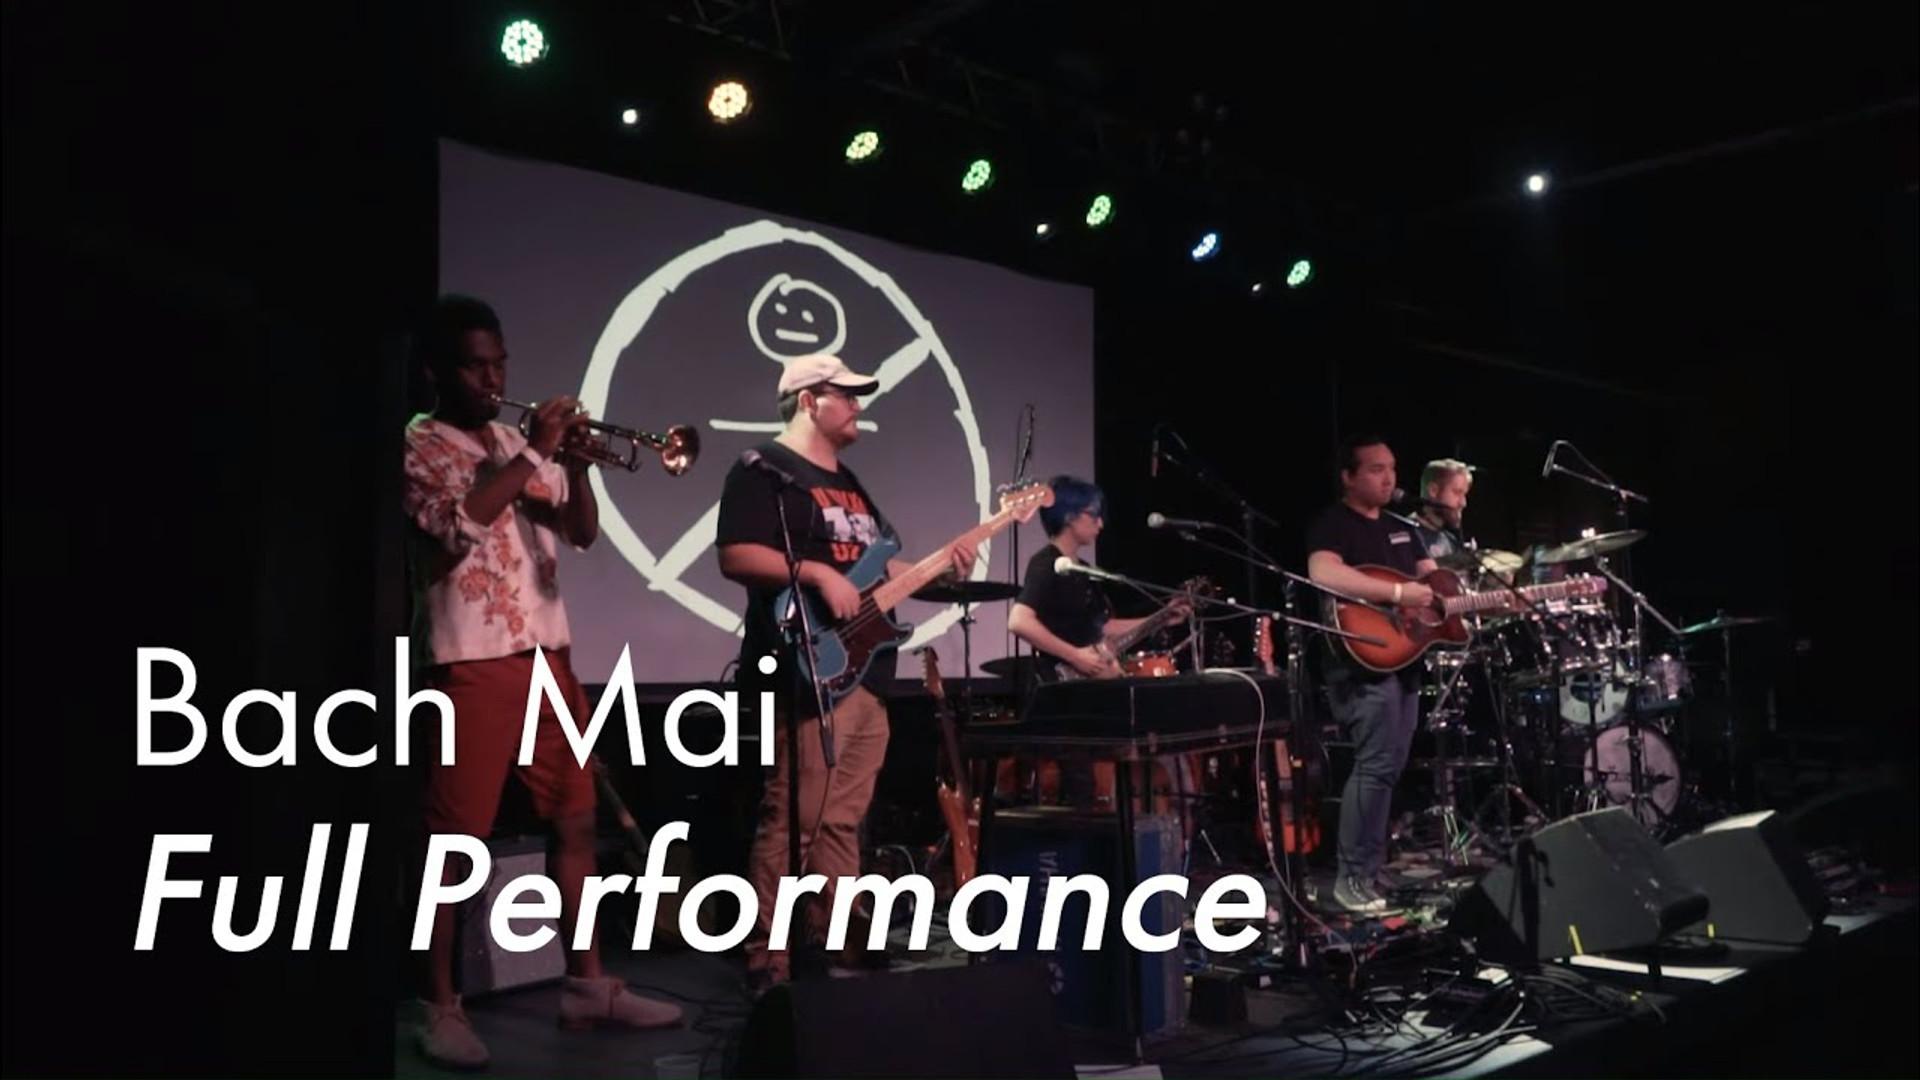 Bach Mai   Full Performance at Maha 2019